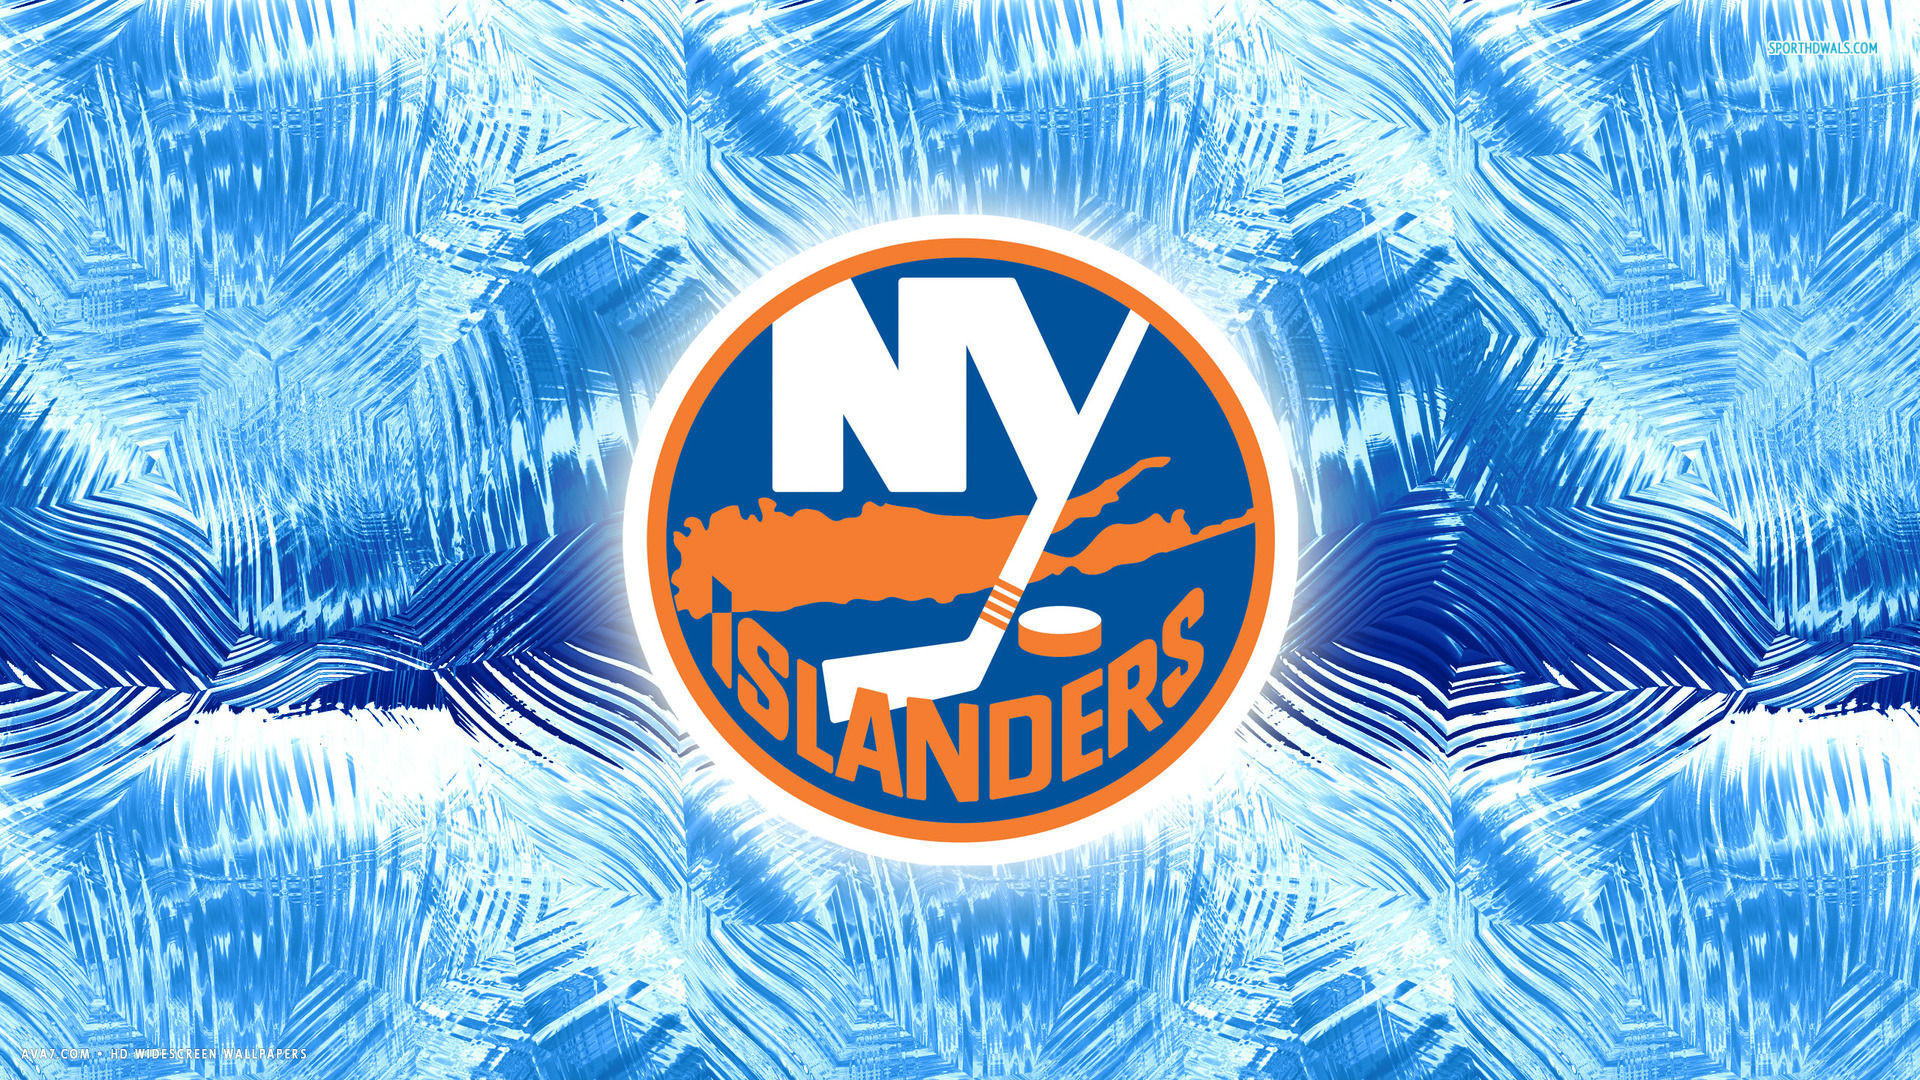 new york islanders nfl hockey team hd widescreen wallpaper